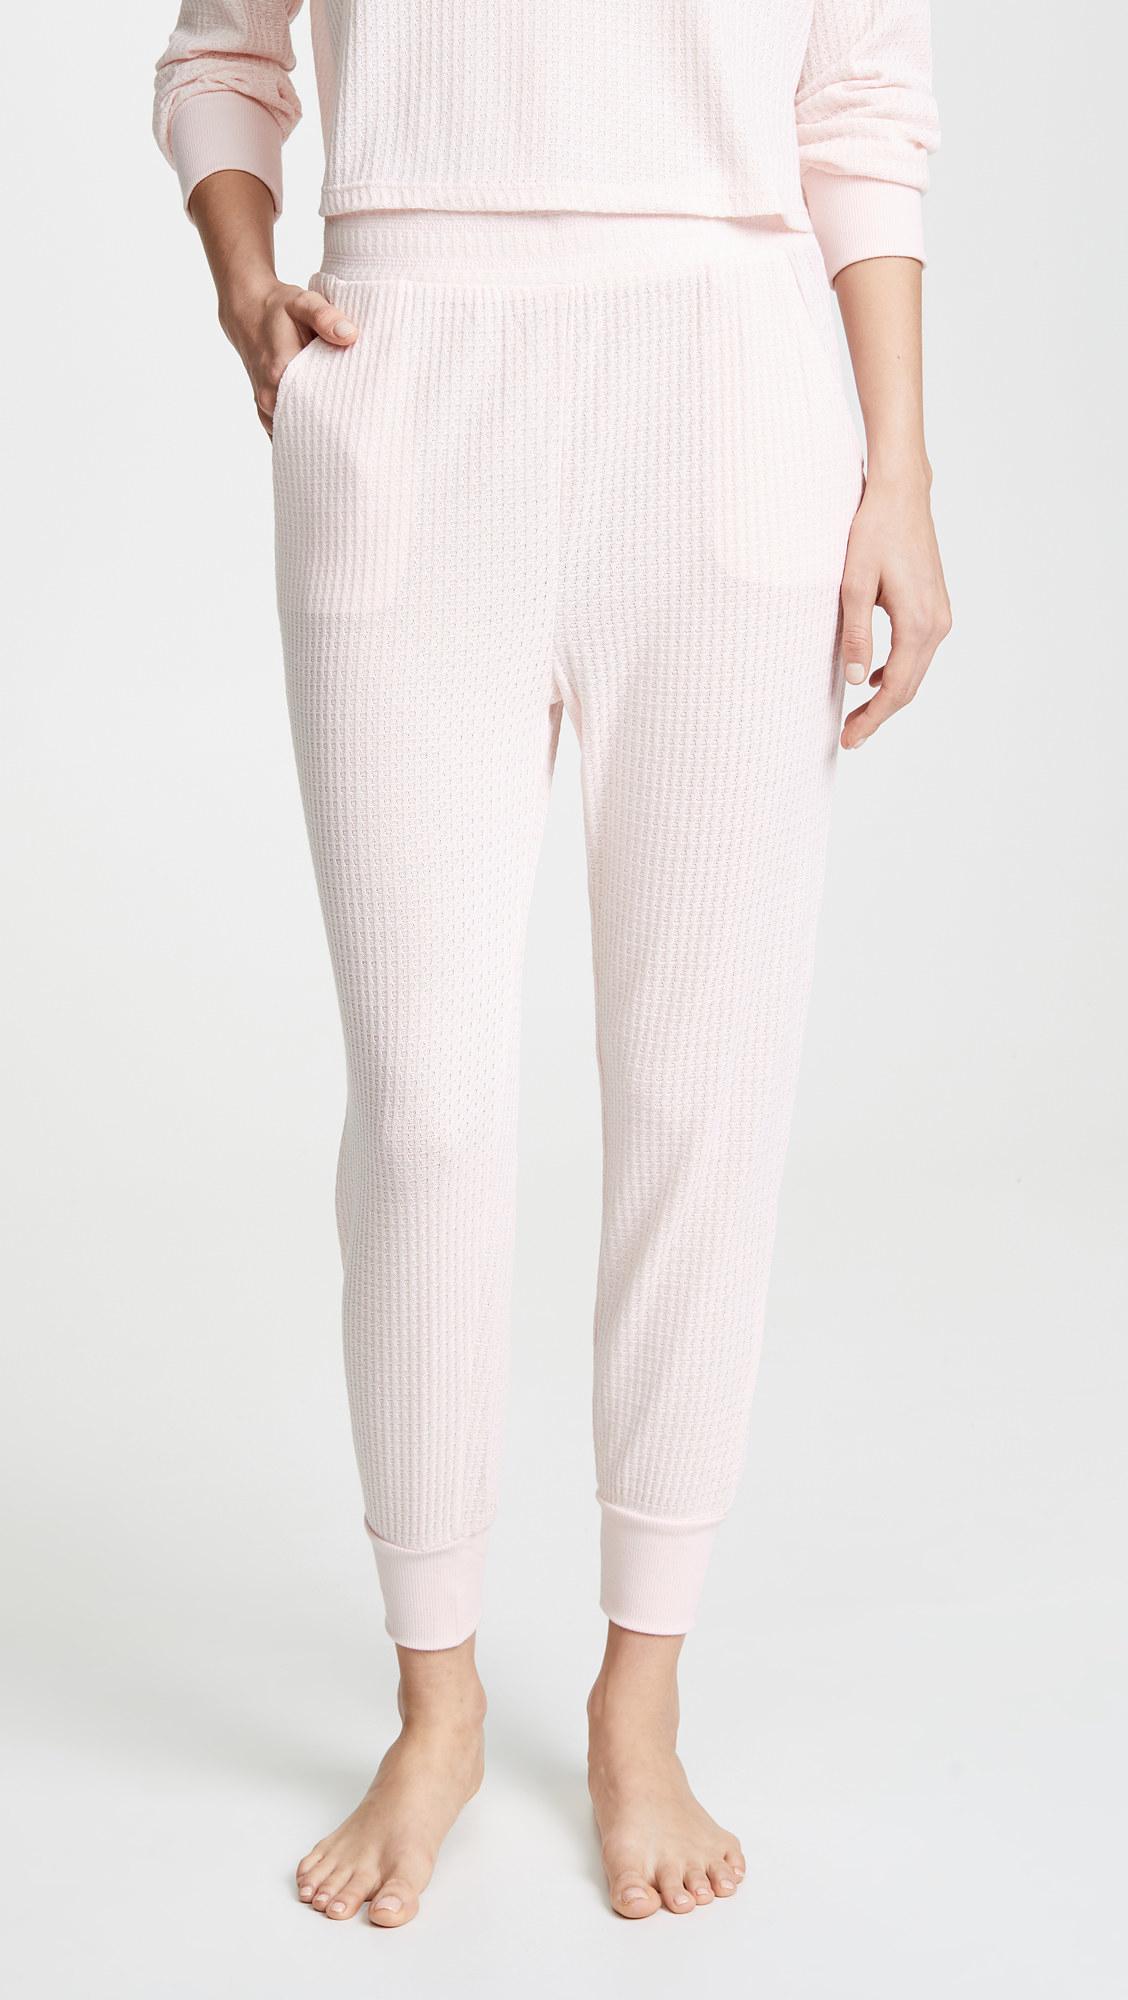 a model wearing blush pink waffle knit pants with cuffed bottoms and a thick waist band